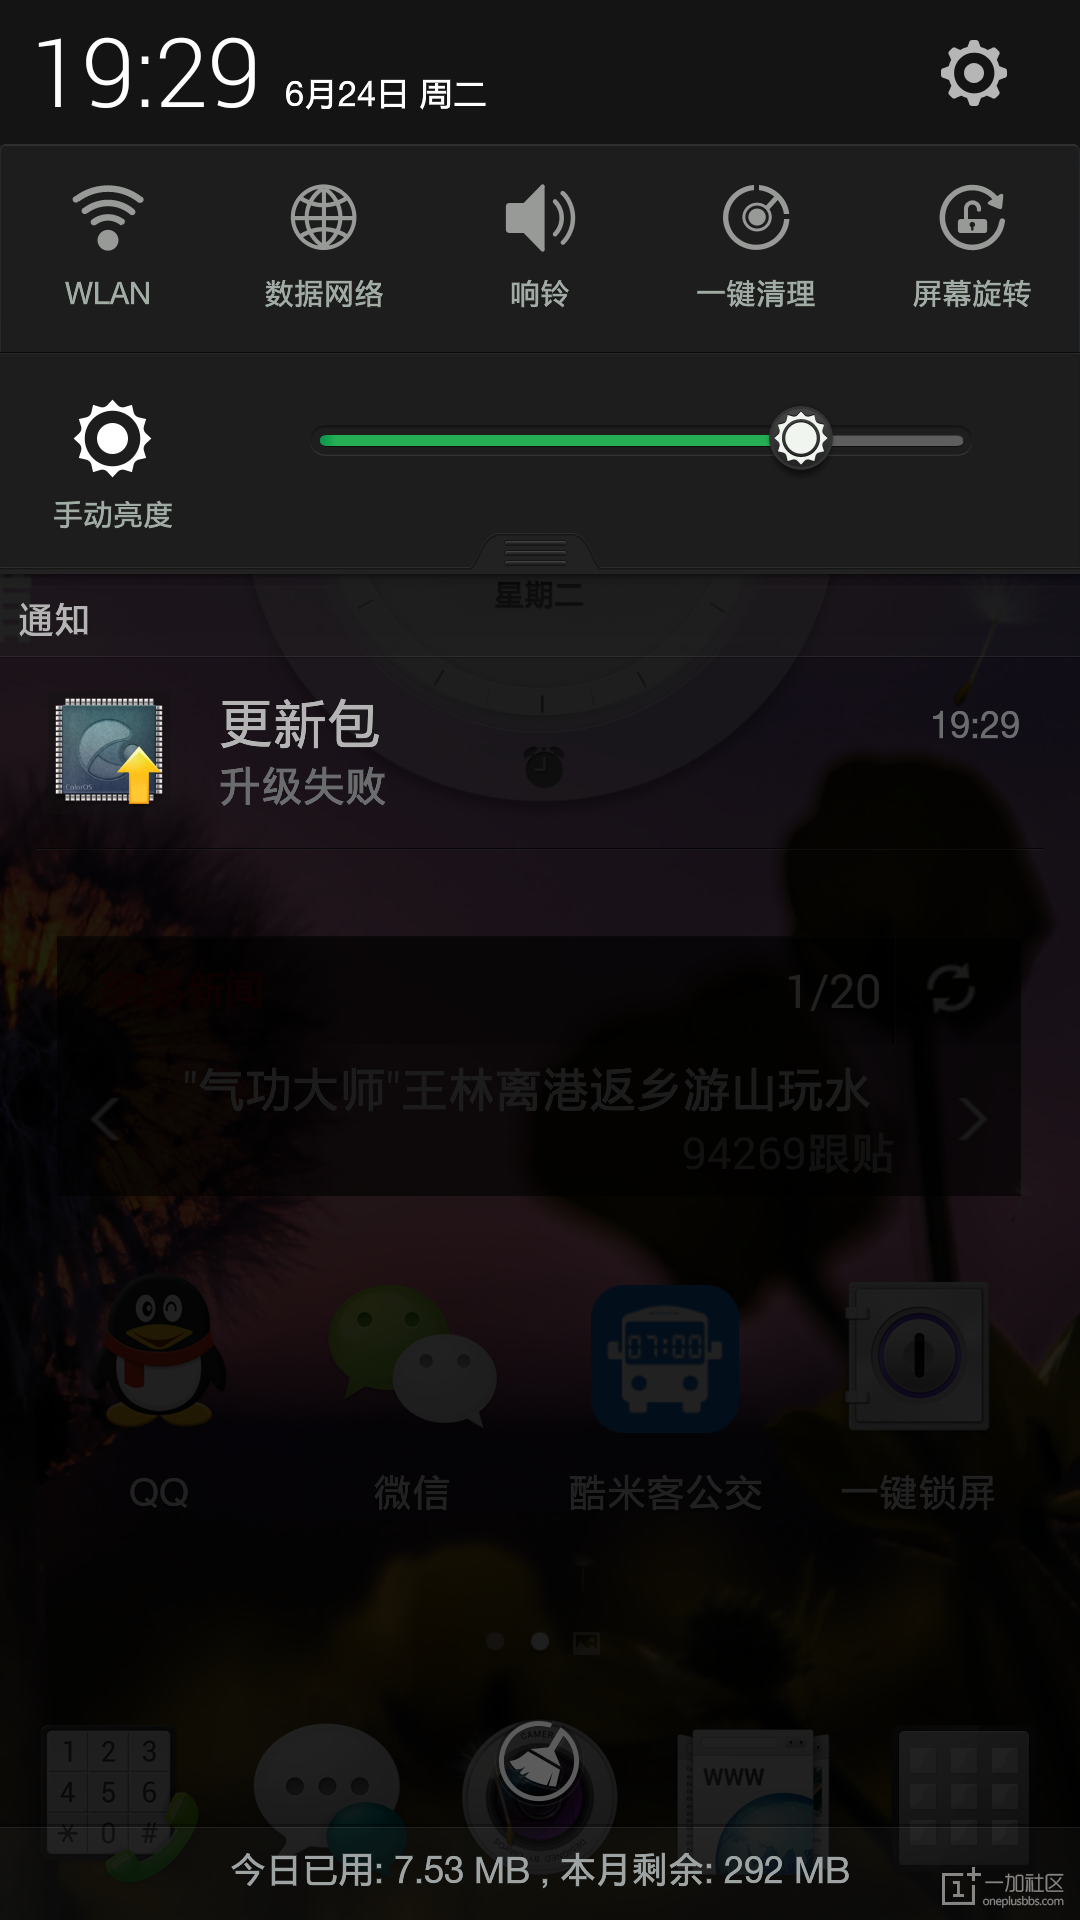 Screenshot_2014-06-24-19-29-36-555.png